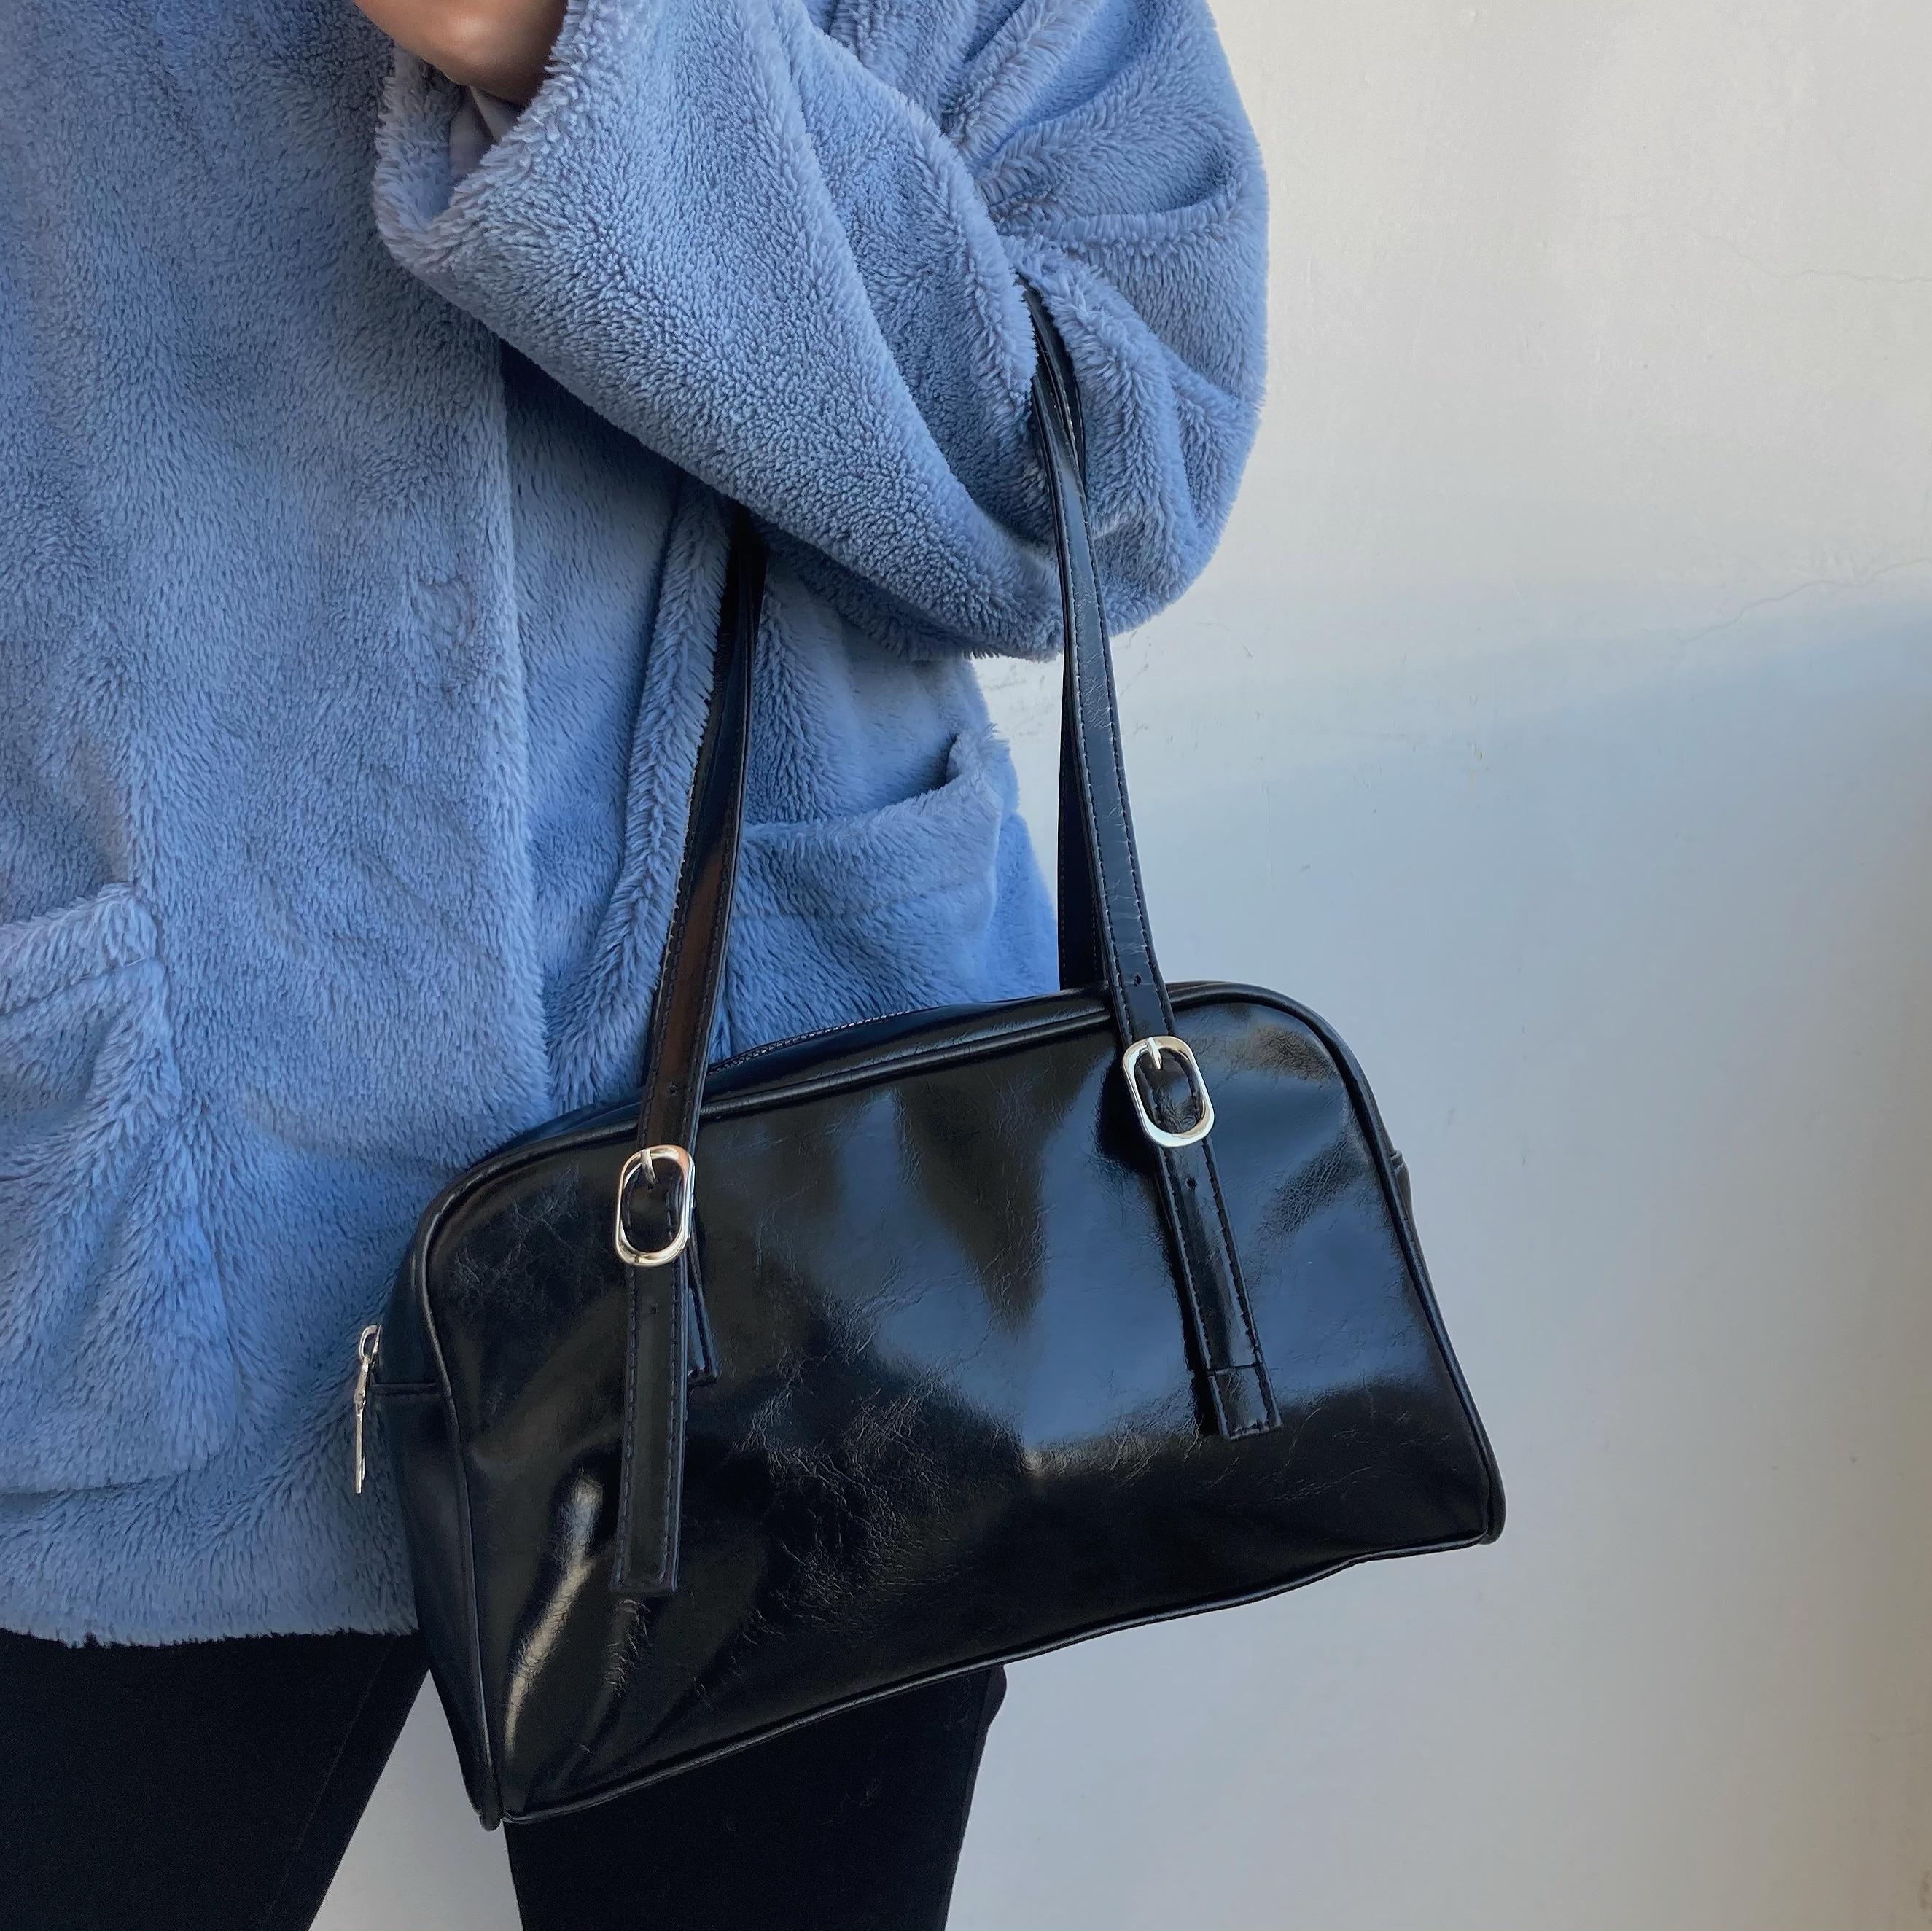 Fashion Design Ladies Underarm Bag Solid Color PU Leather Women Shoulder Bag Large Capacity Female Casual Tote Purse Handbags